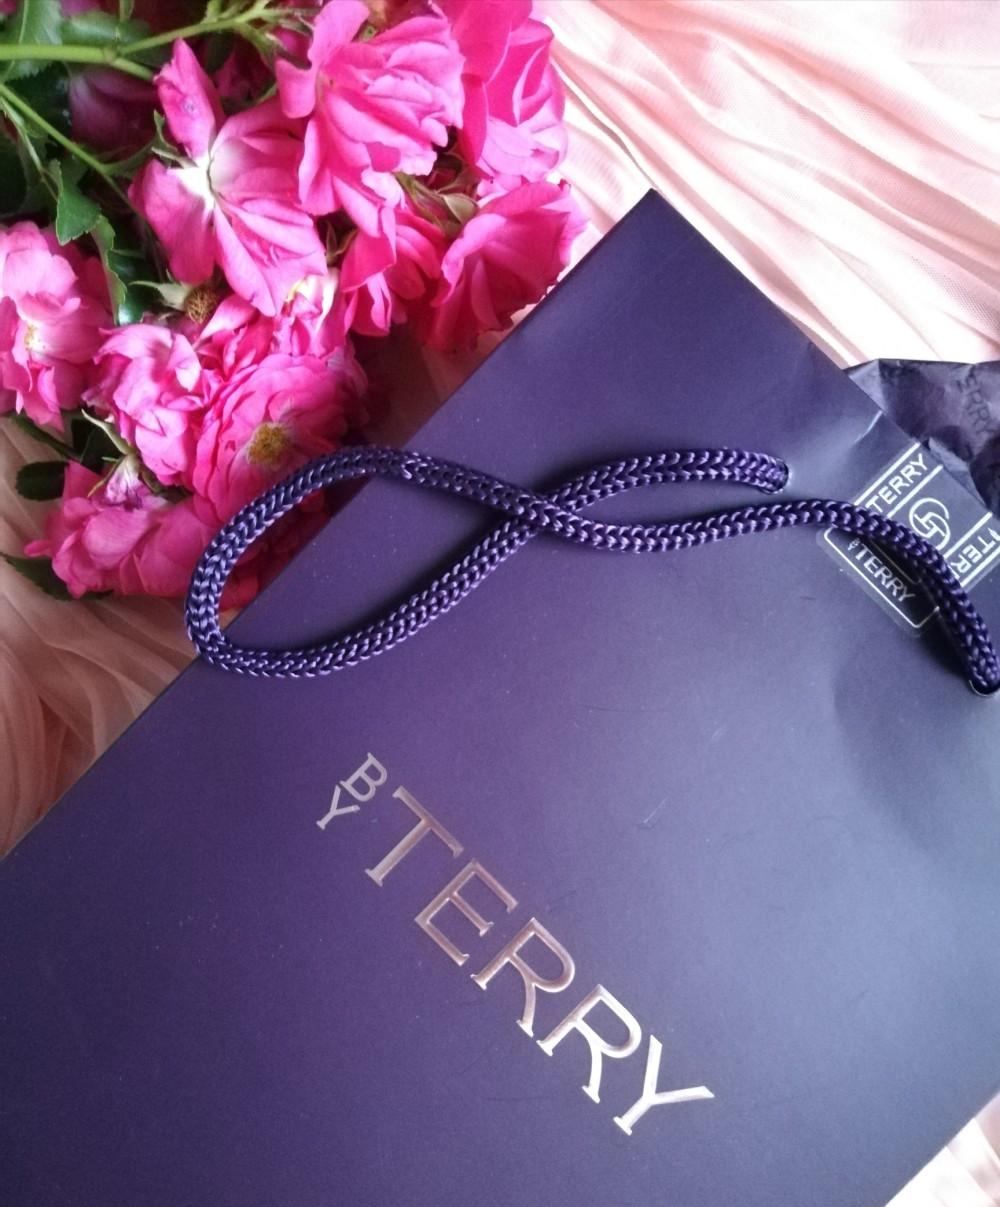 Recensione del nuovo fondotinta By Terry